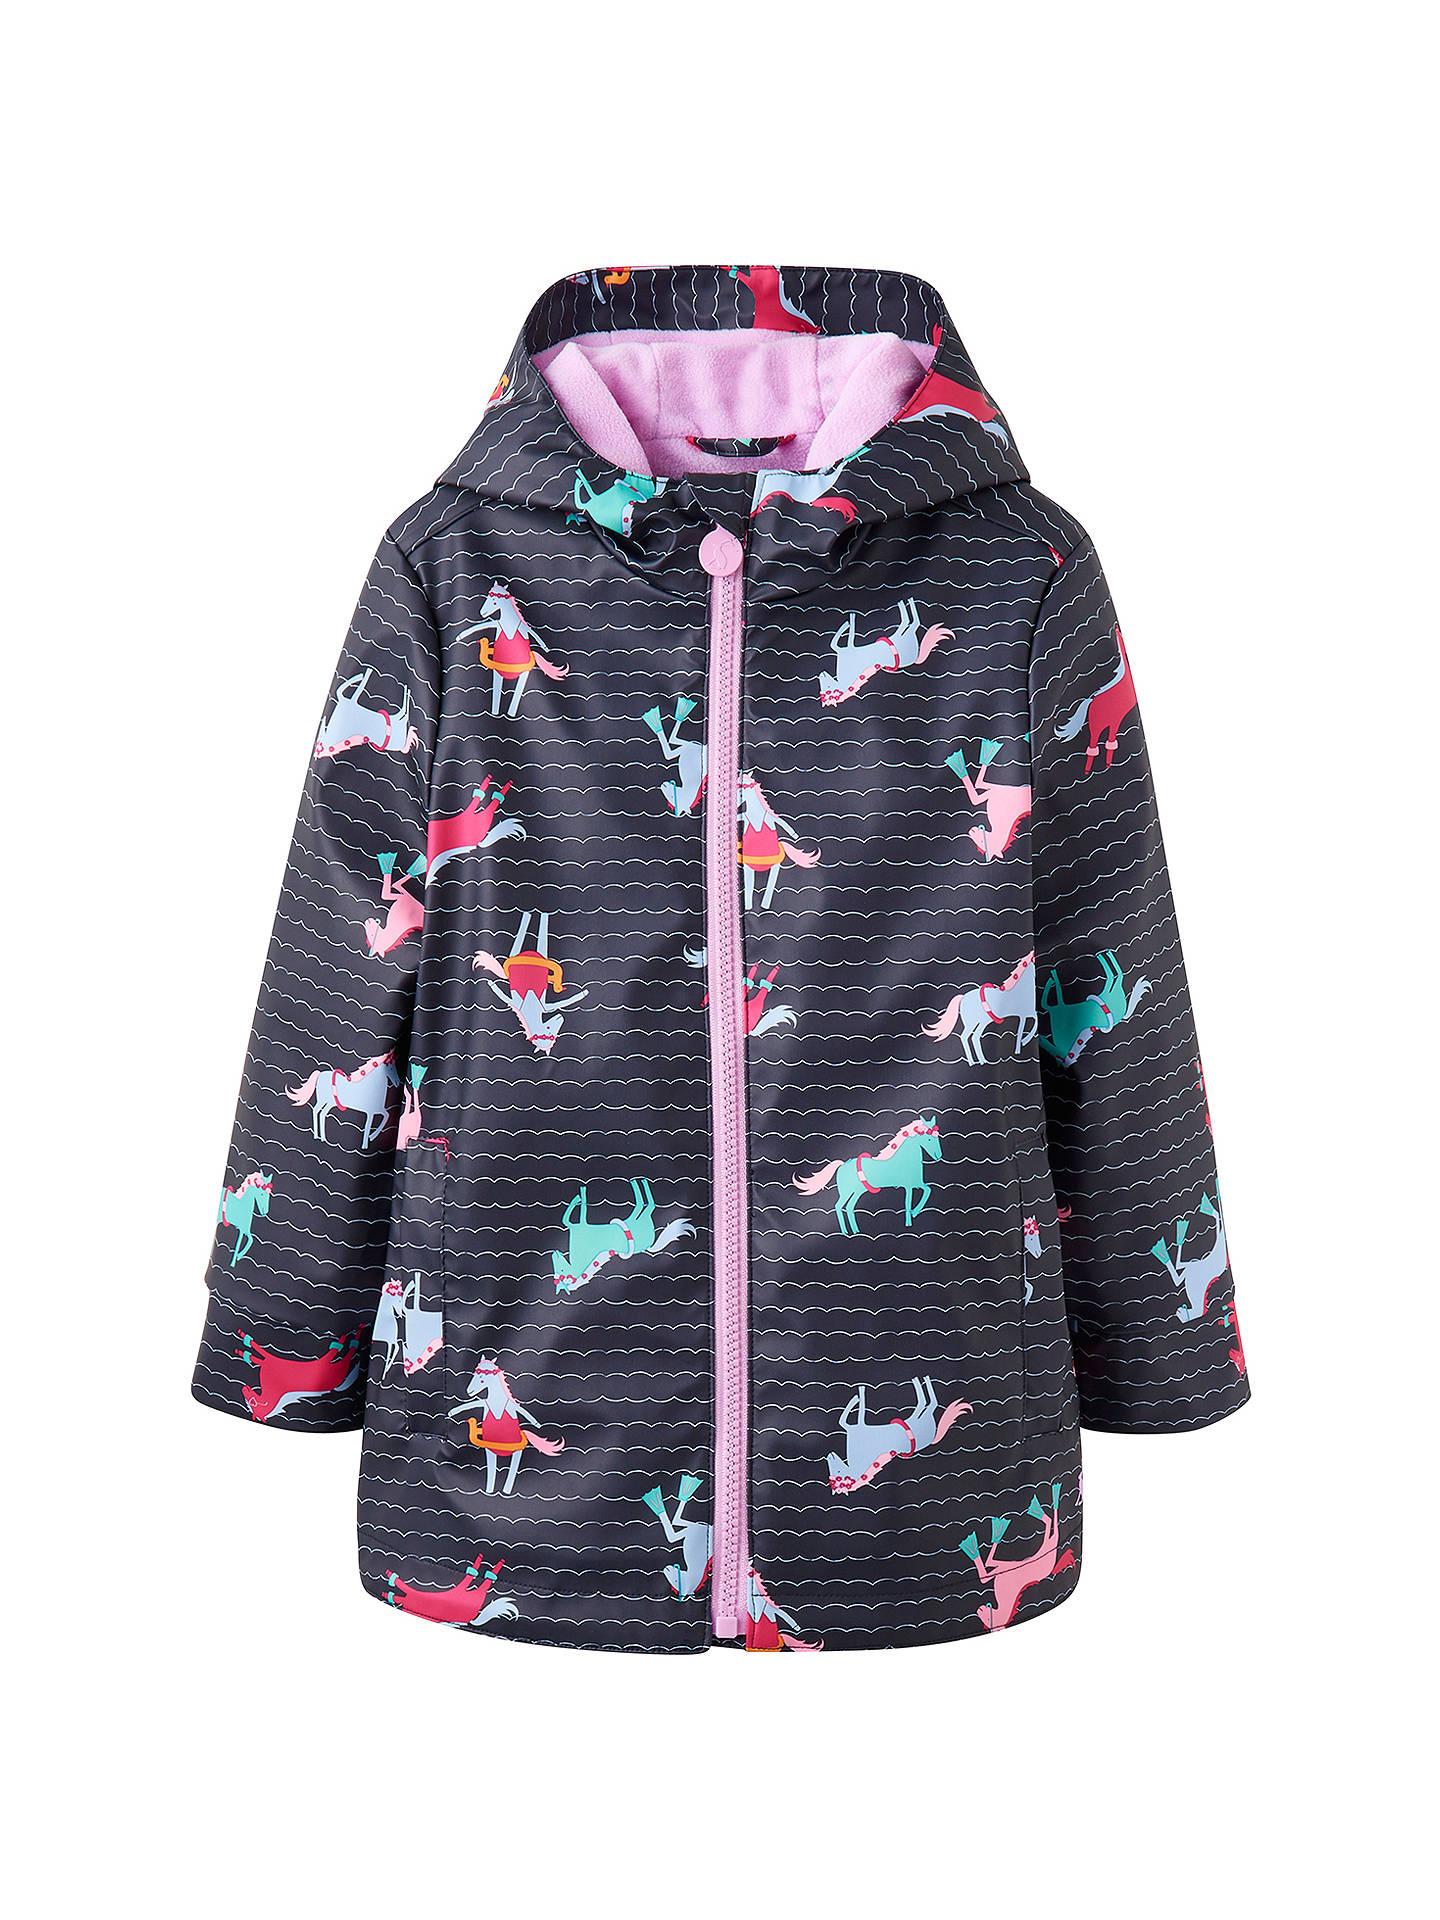 ef1c86cfc Buy Little Joule Girls' Raindance Horse Waterproof Coat, Navy, 7-8 years ...